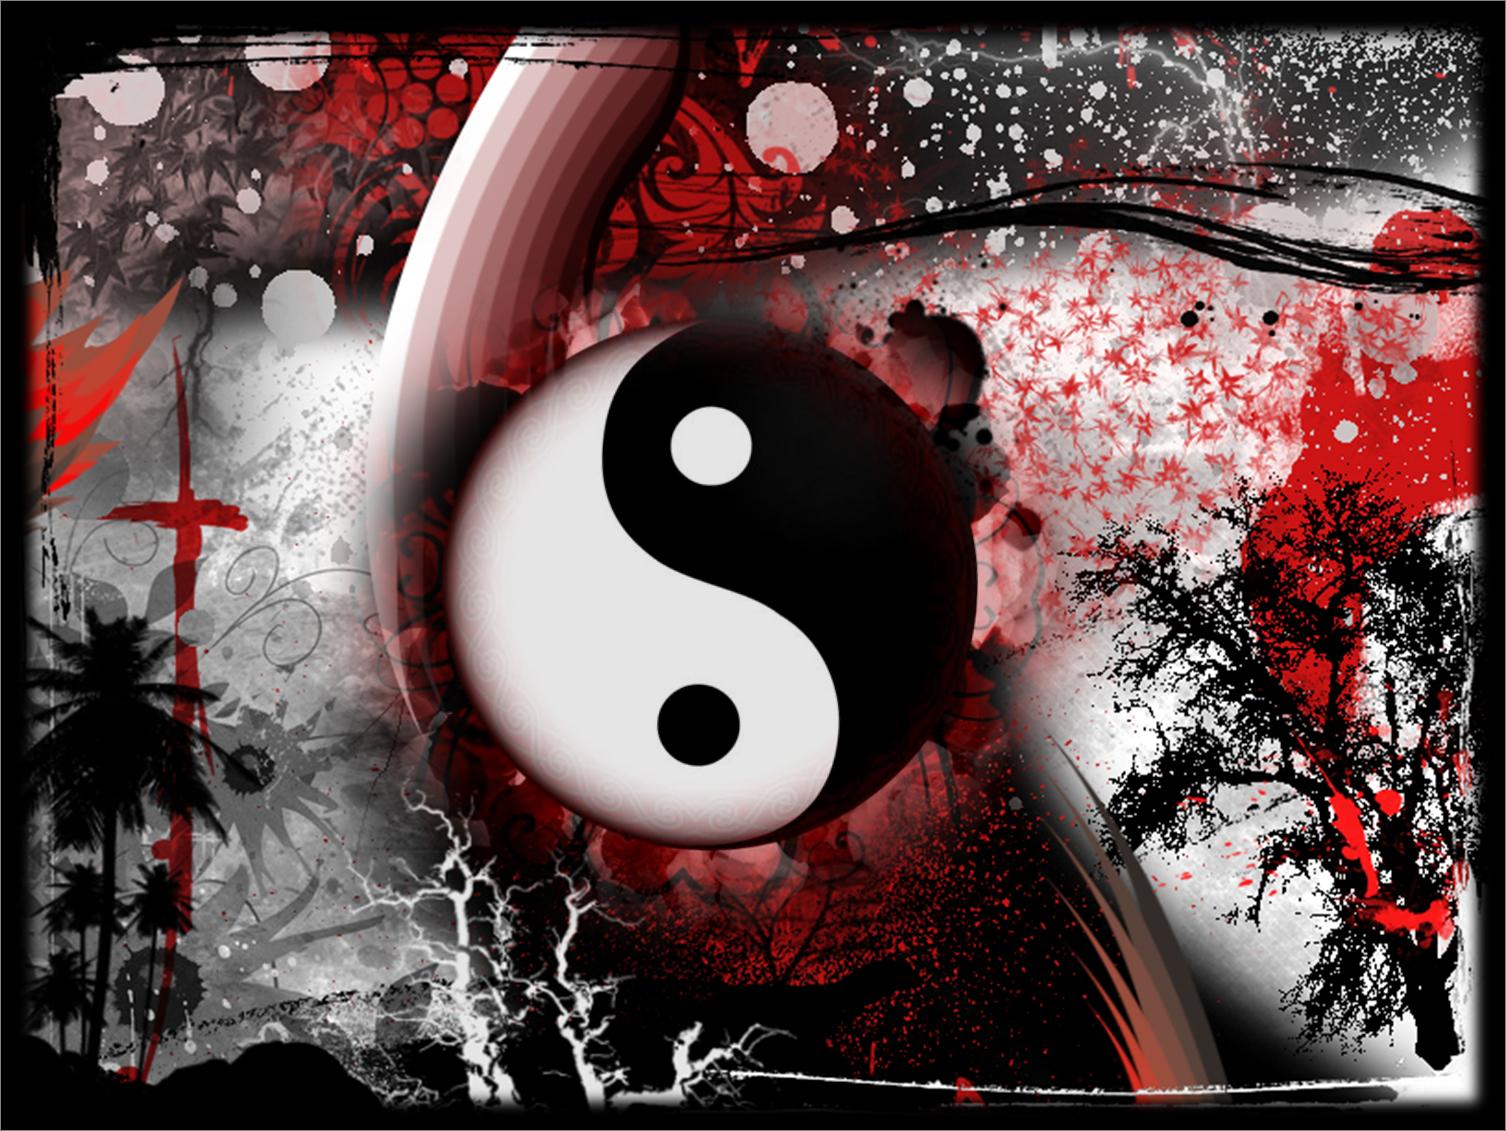 Black Red White Wallpaper by DeafbutforMusicpng 1506x1131